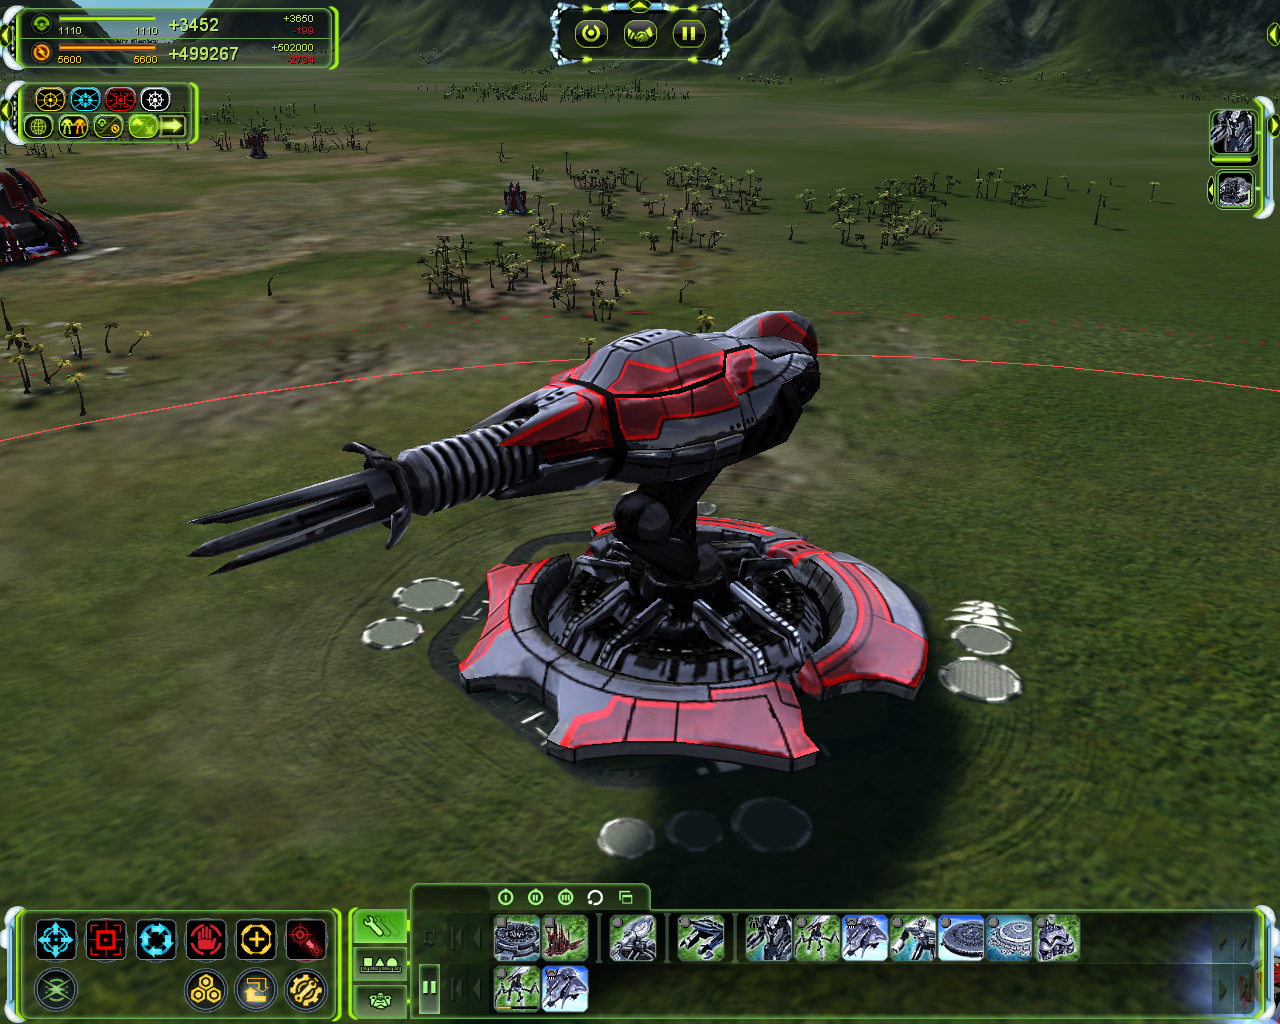 https://supreme-commander.ru/upload/emissary.jpg